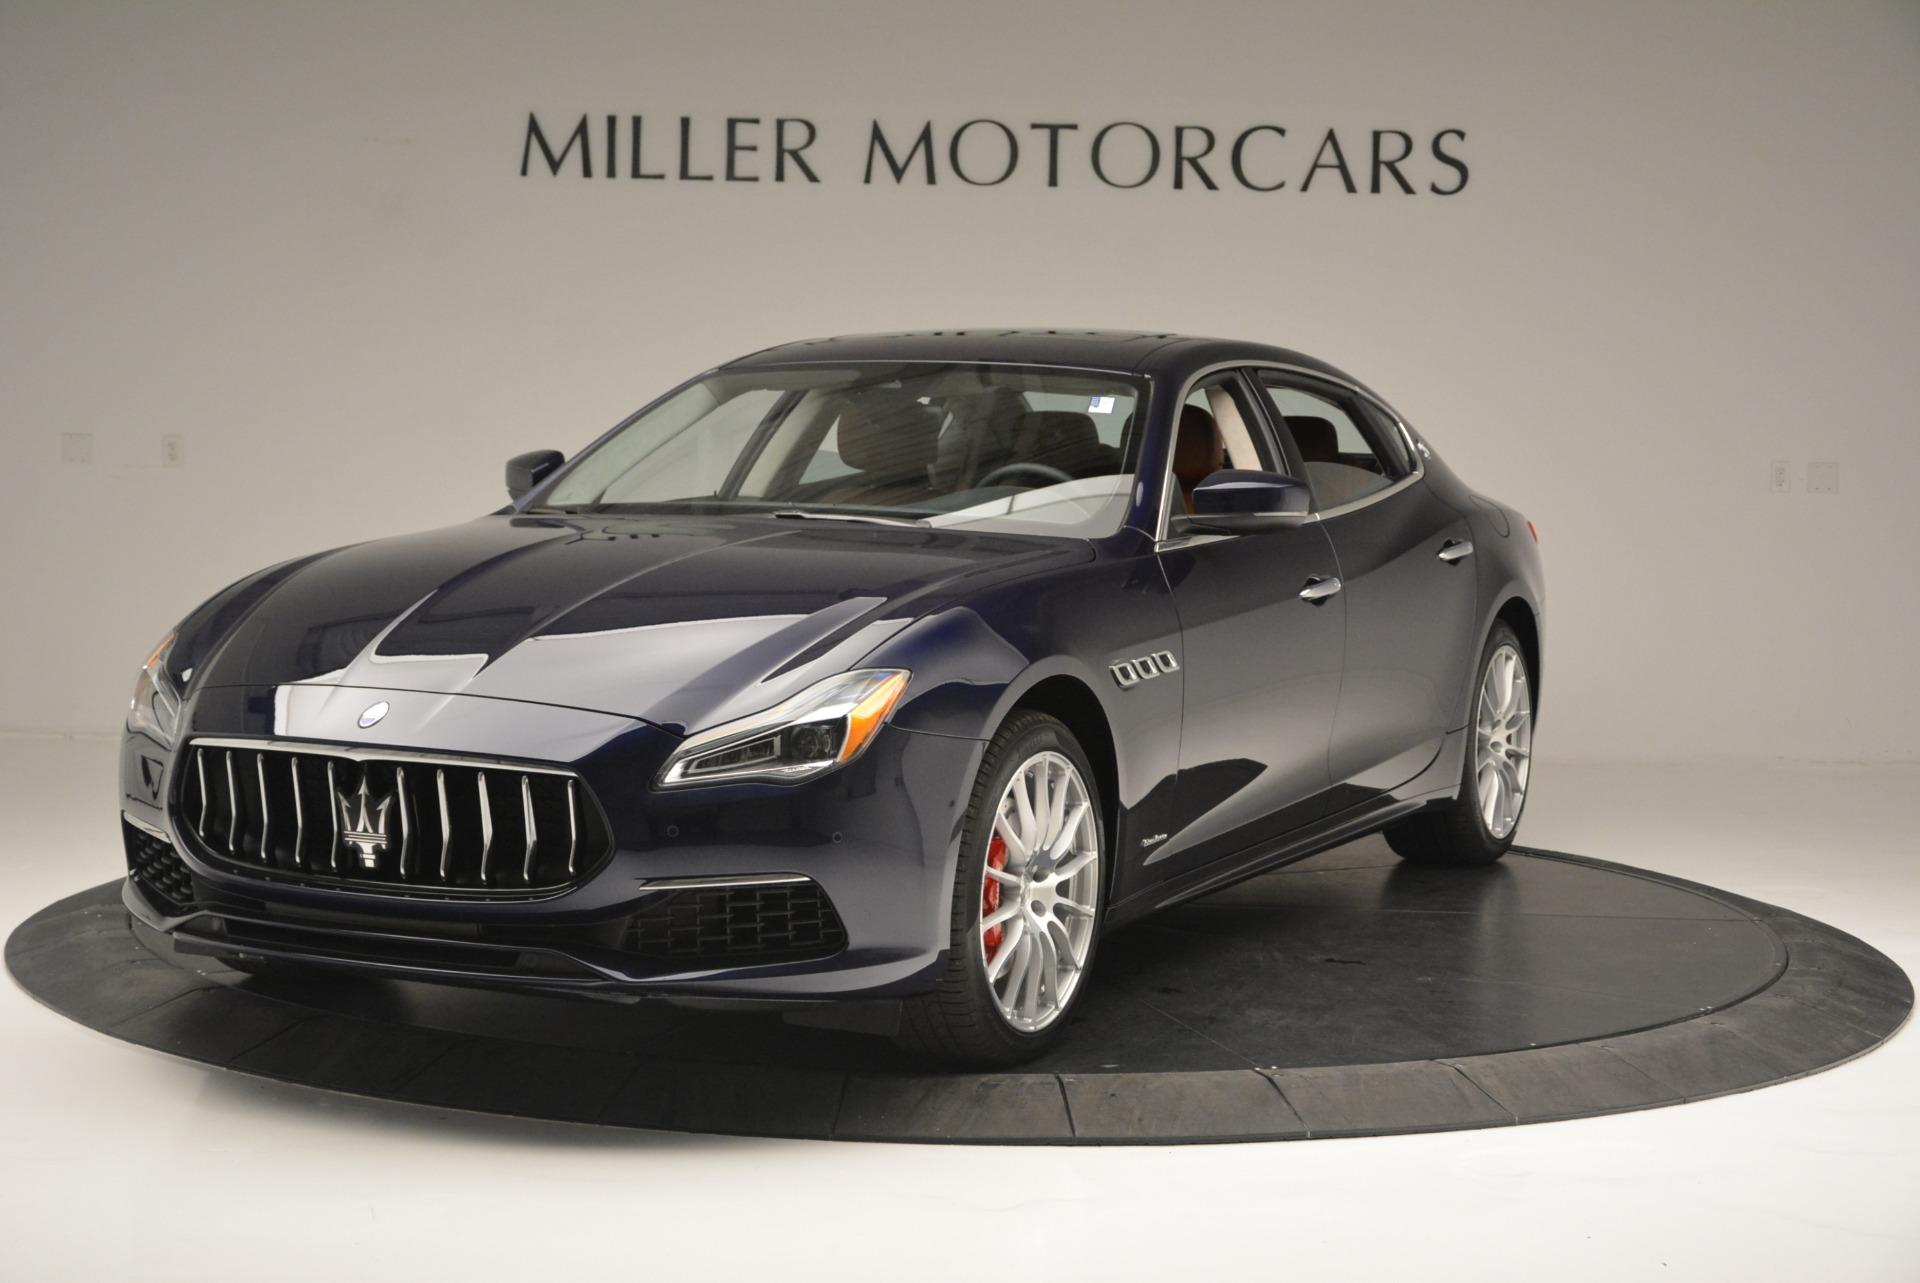 New 2018 Maserati Quattroporte S Q4 GranLusso For Sale In Westport, CT 1859_main